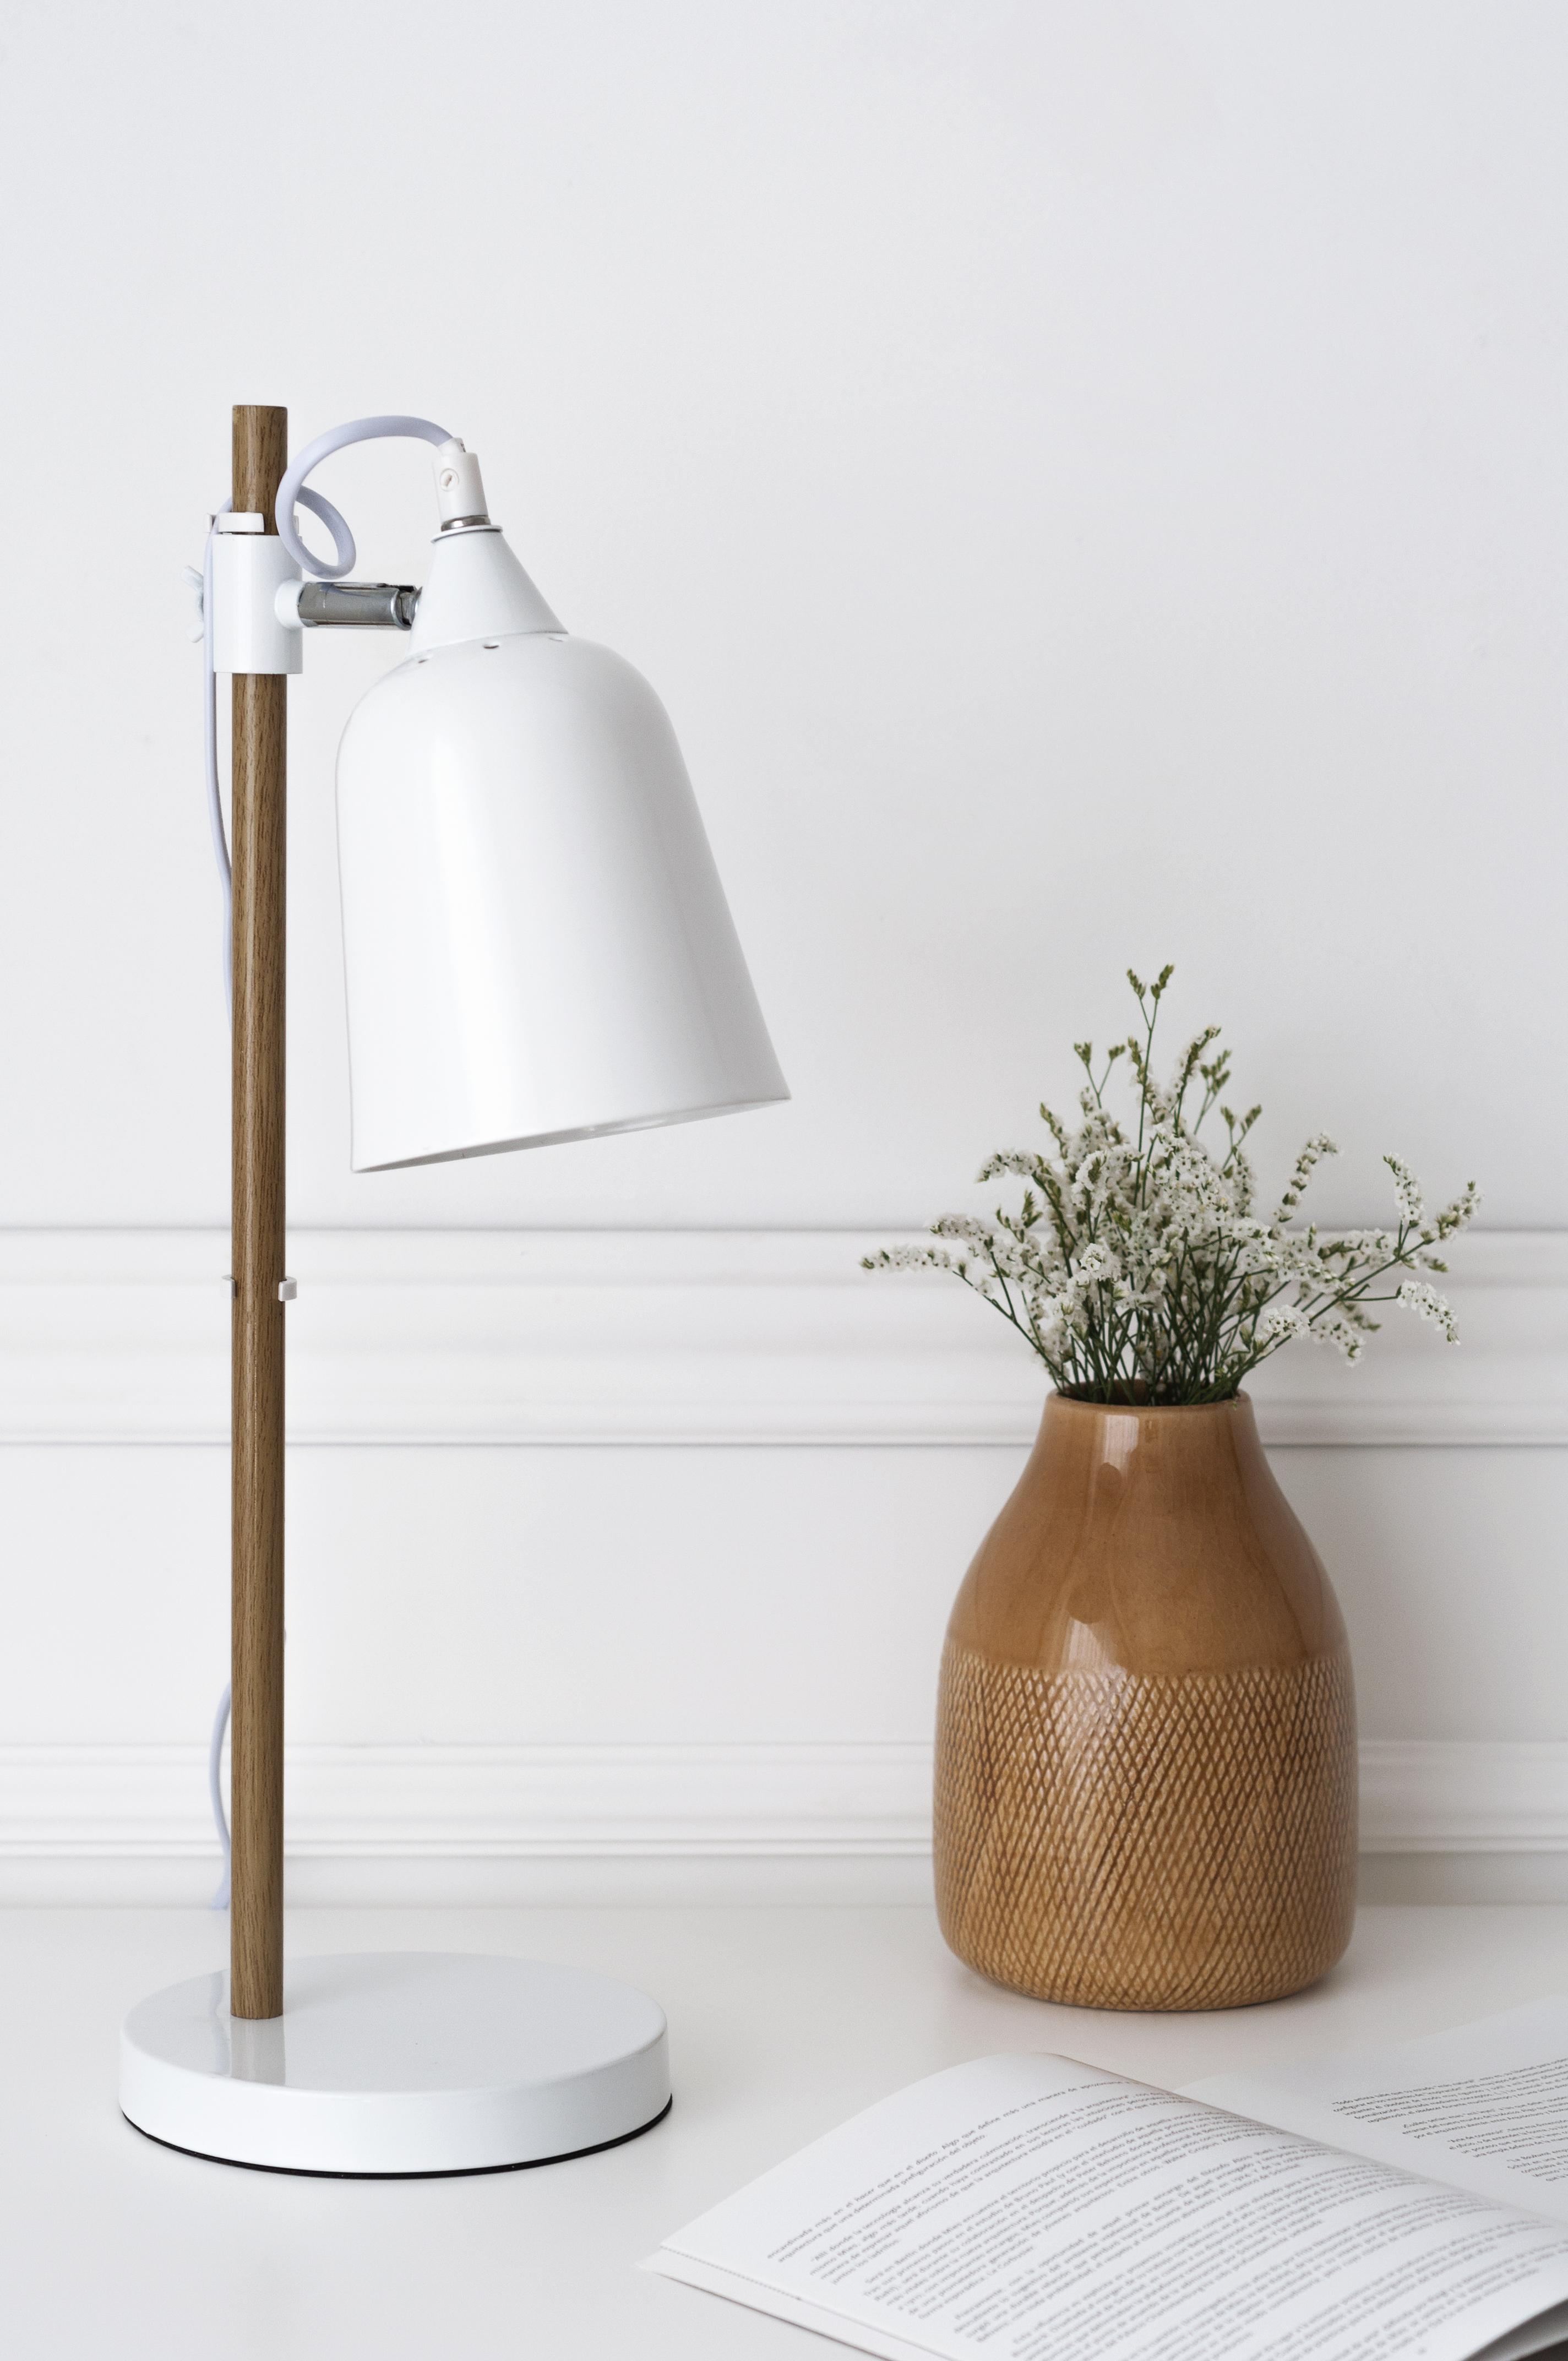 KP-1264BL Crom lámpara de mesa blanca 02